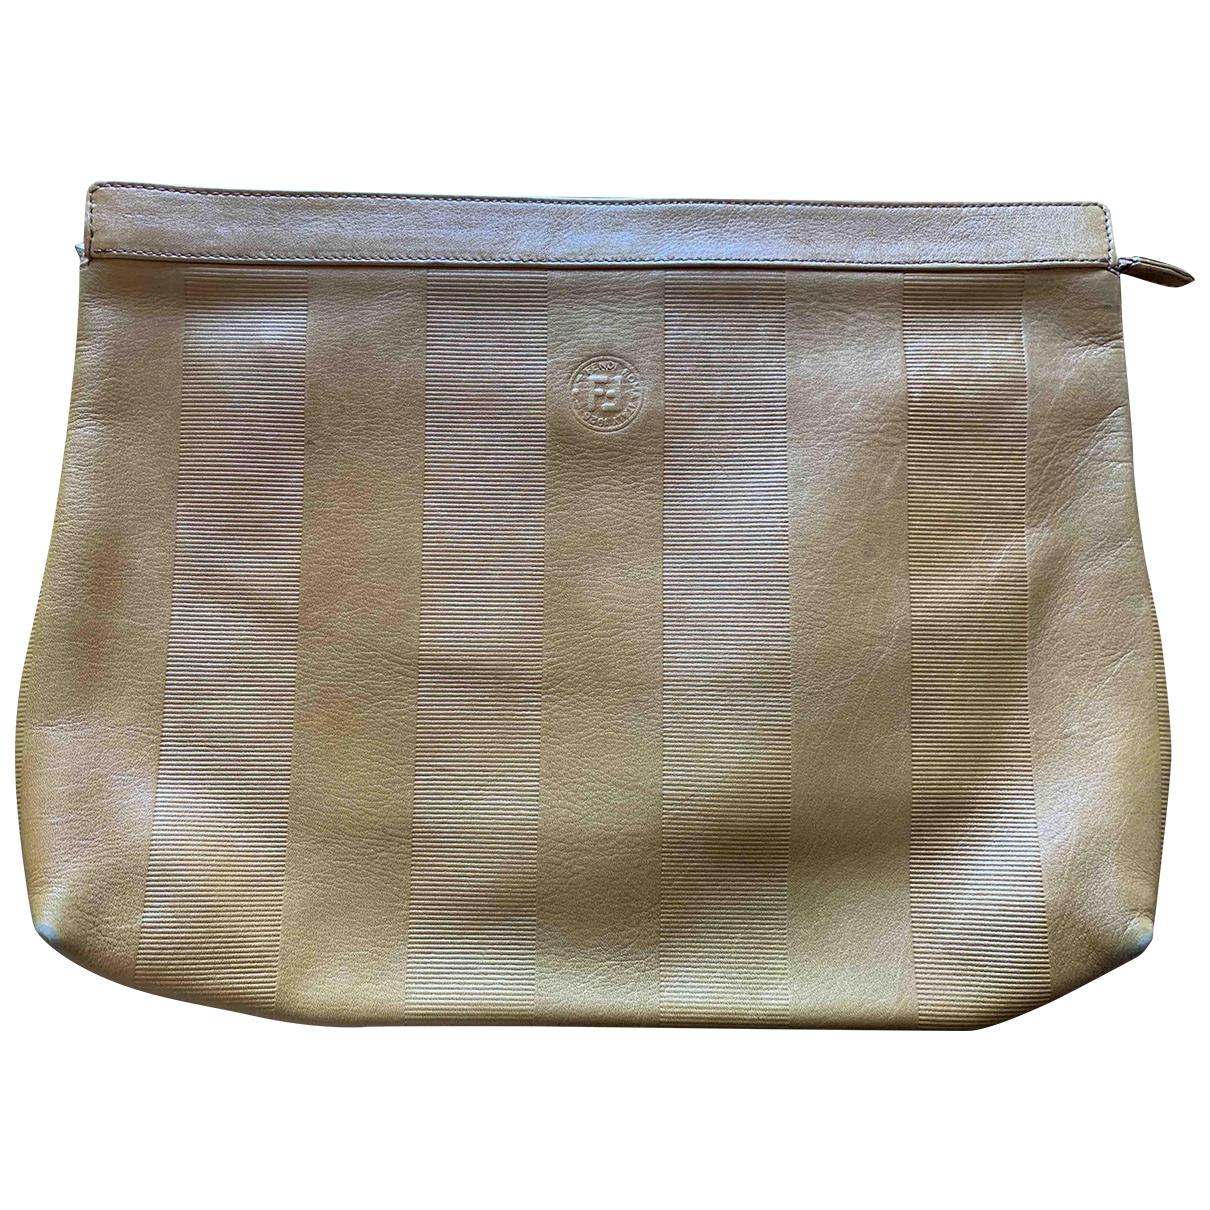 Fendi \N Brown Leather Clutch bag for Women \N